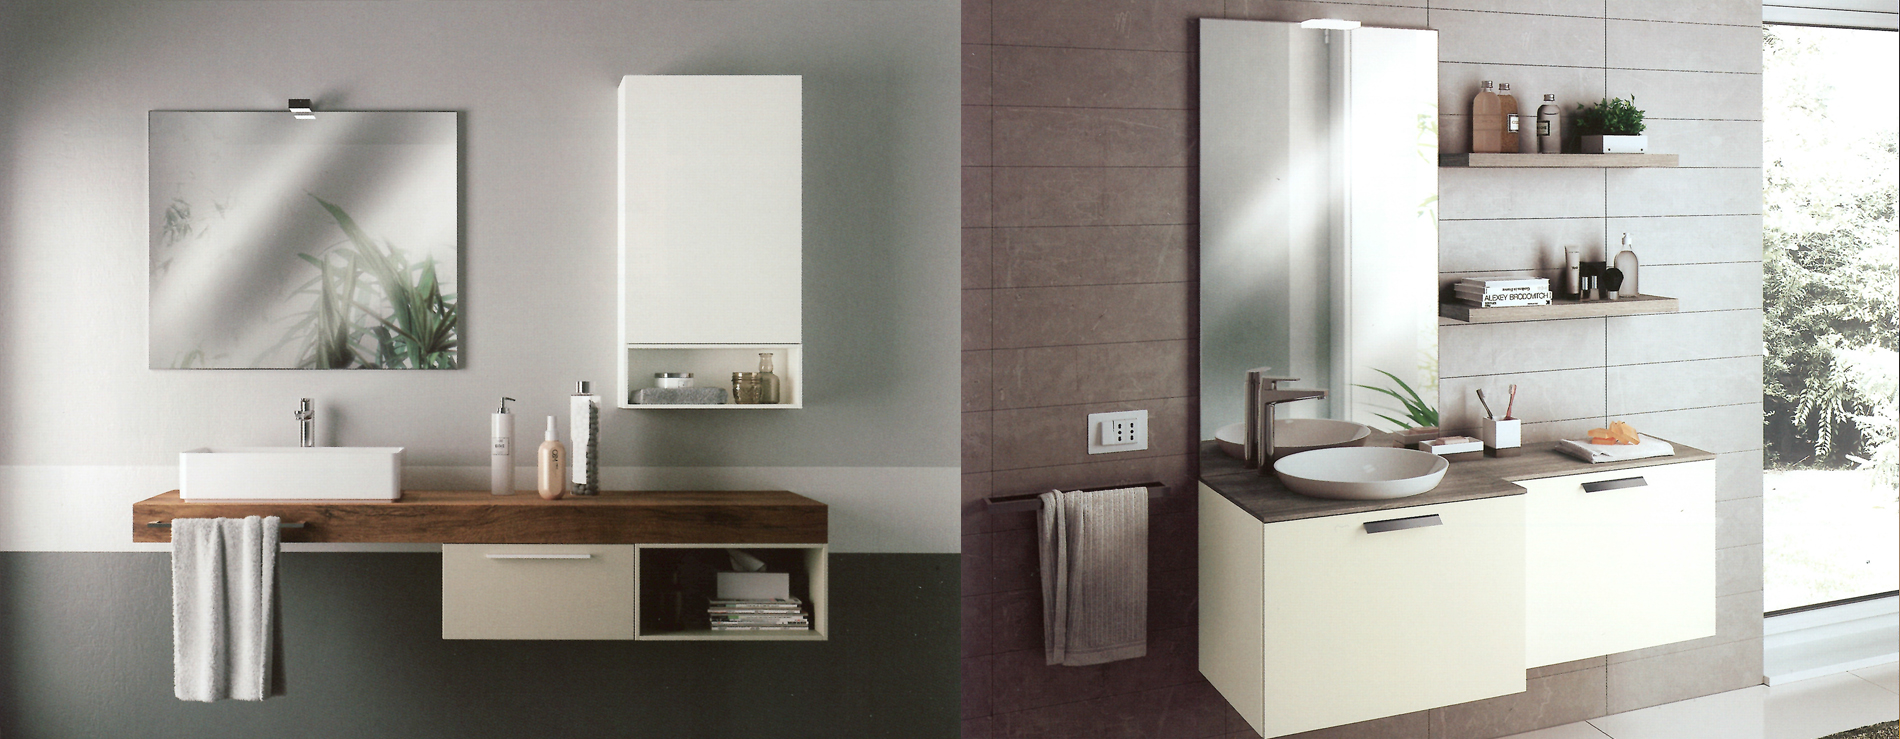 Mobili bagno piccoli spazi prfrence bagni moderni piccoli for Piccoli mobili da bagno